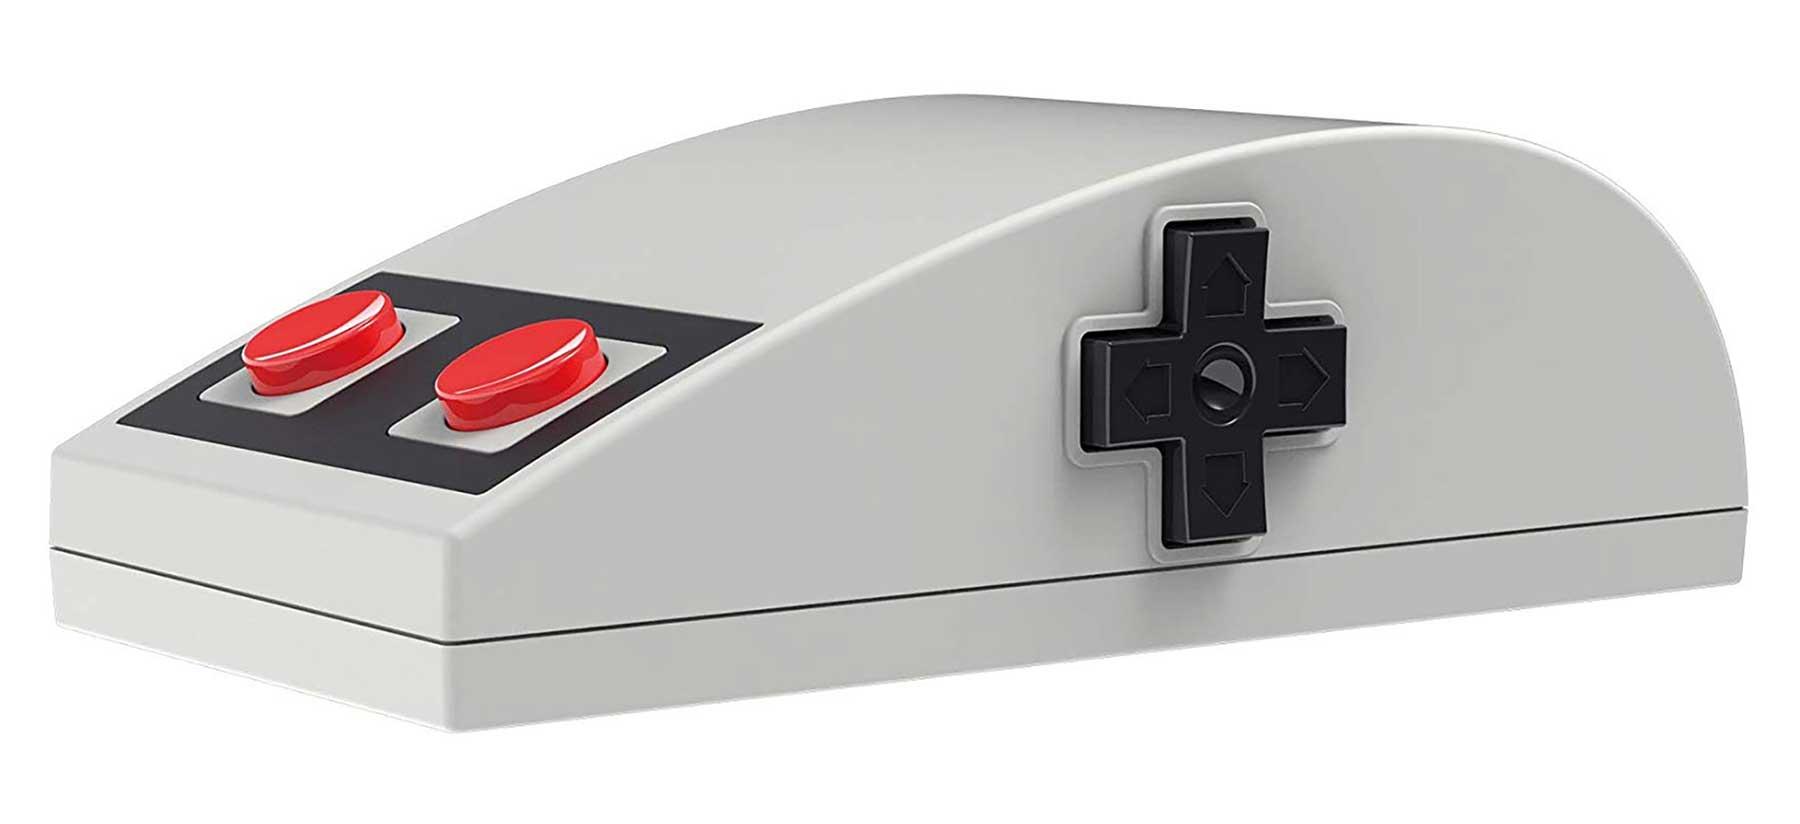 Computermaus im NES-Controller-Look NES-controller-computermaus_03